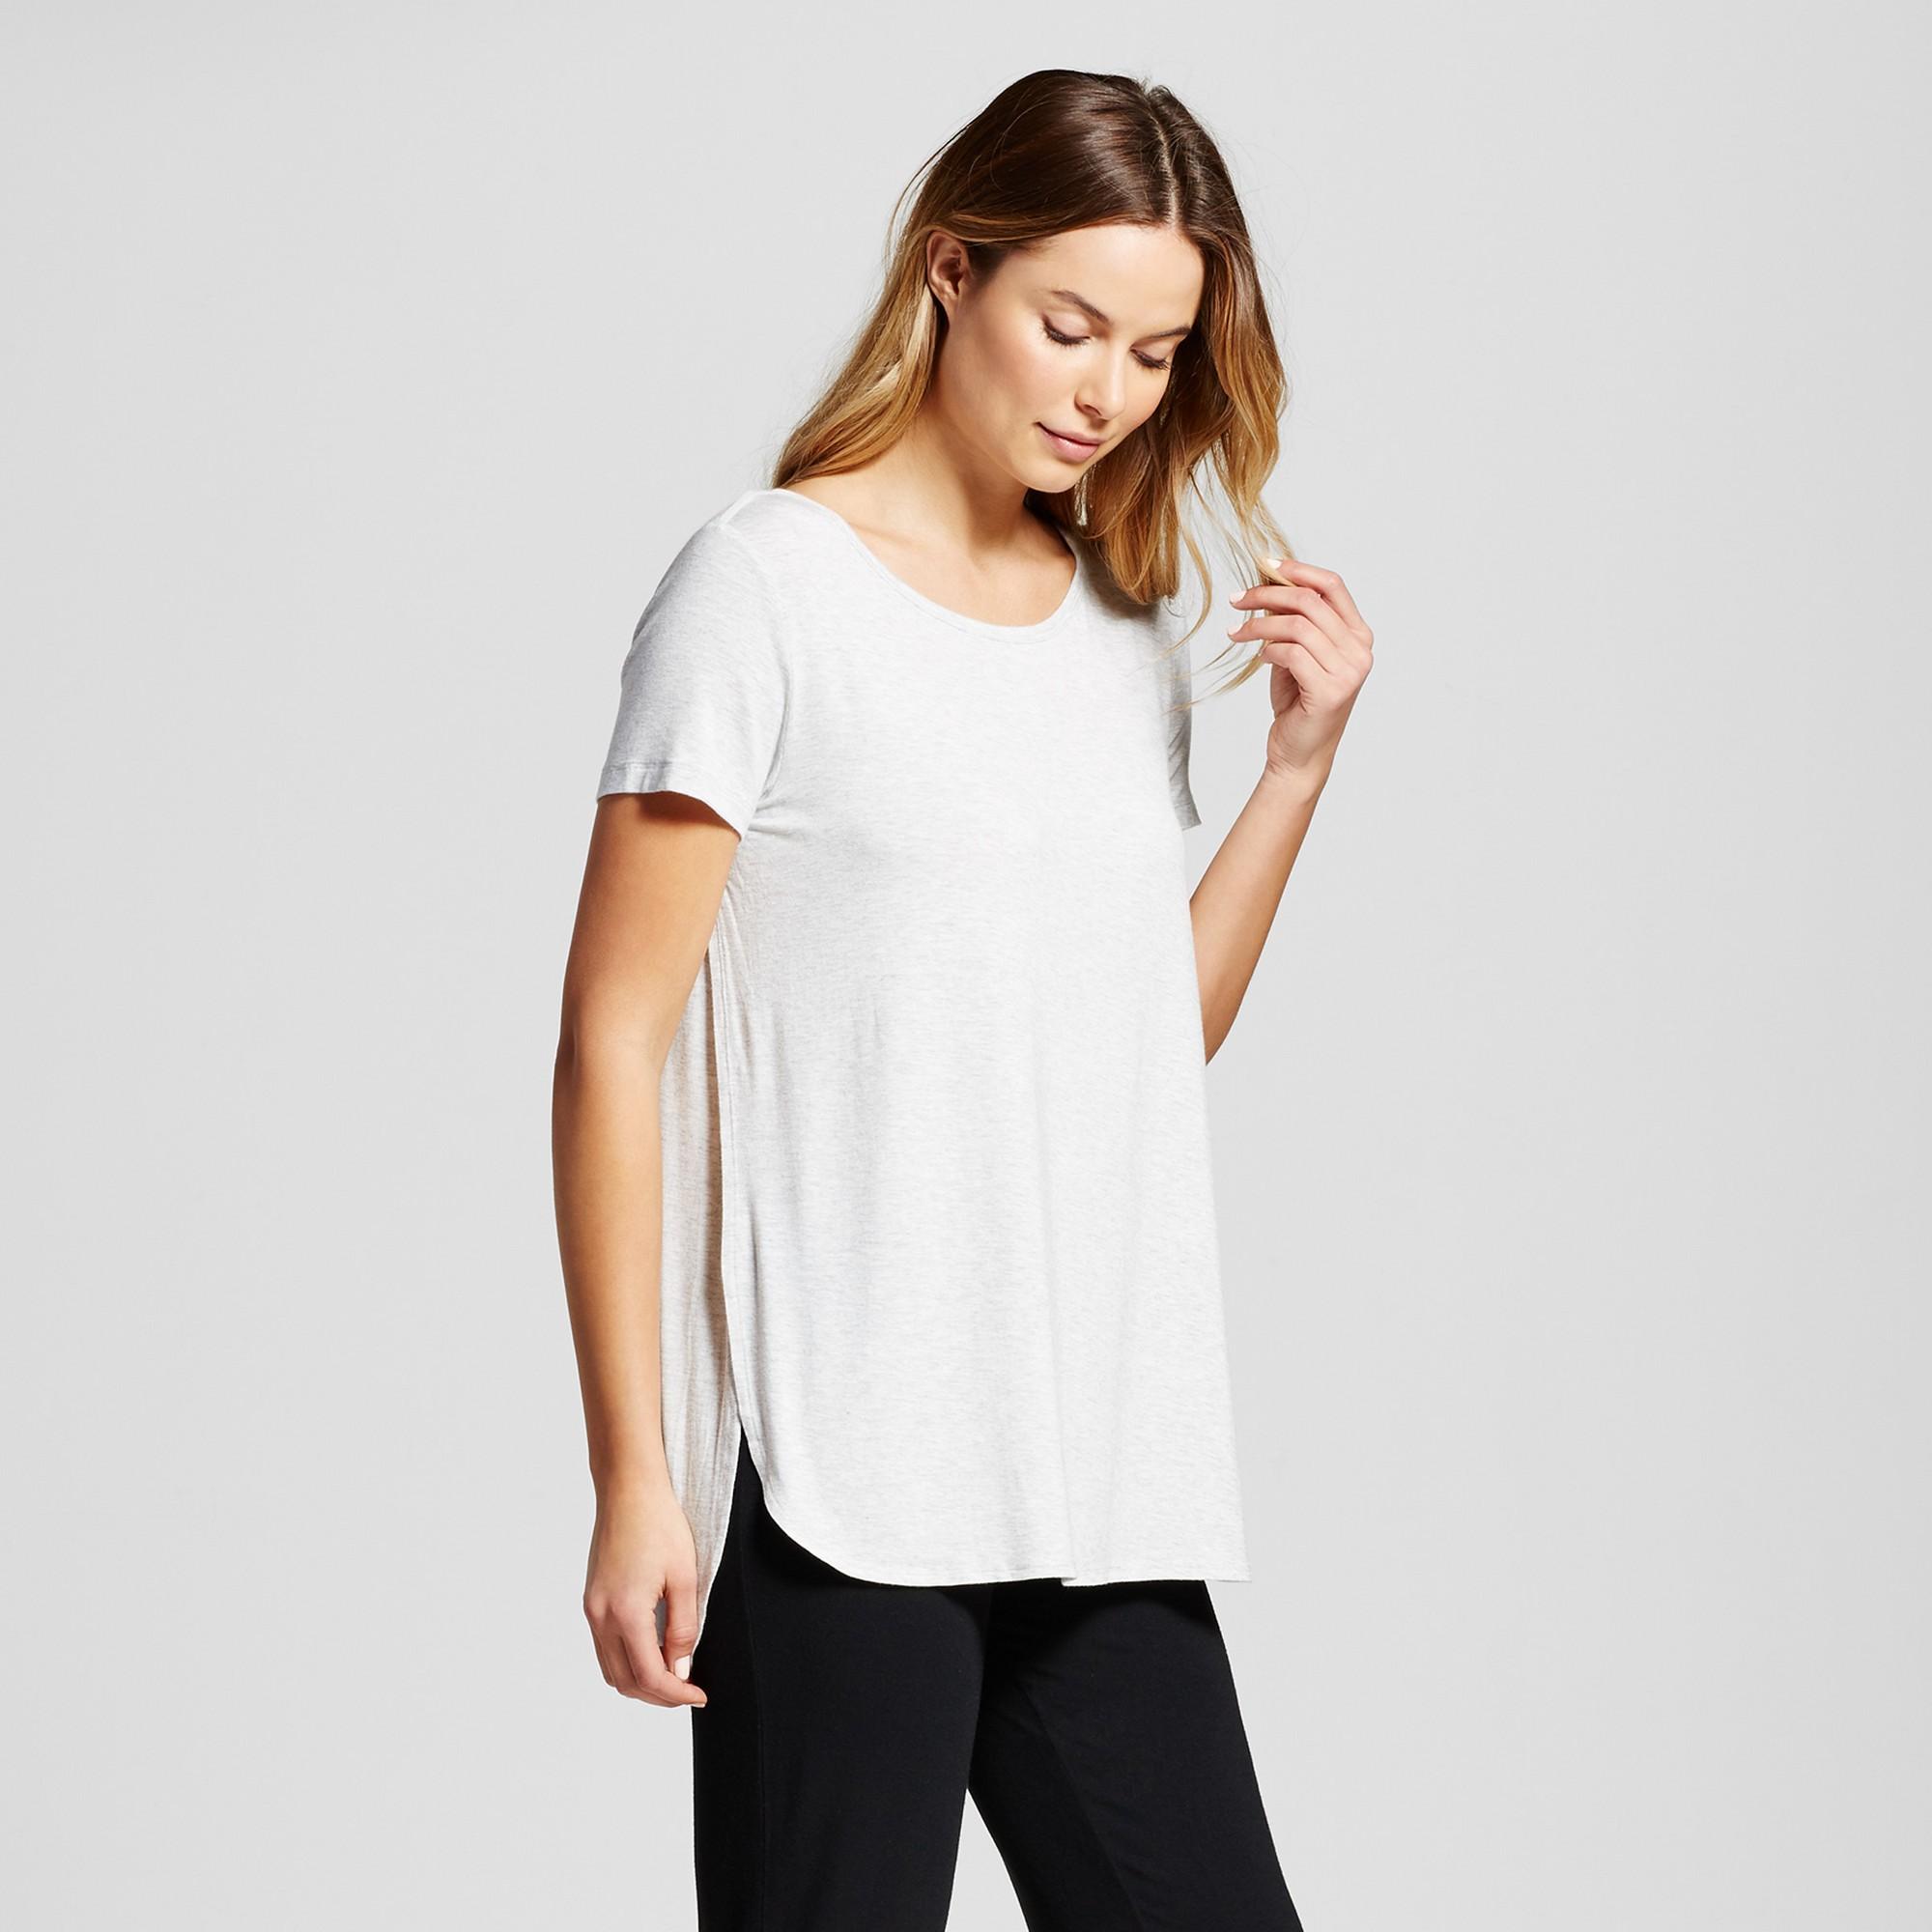 07660cd69ee6e Maternity Nursing Sleep T-Shirt - Light Gray S